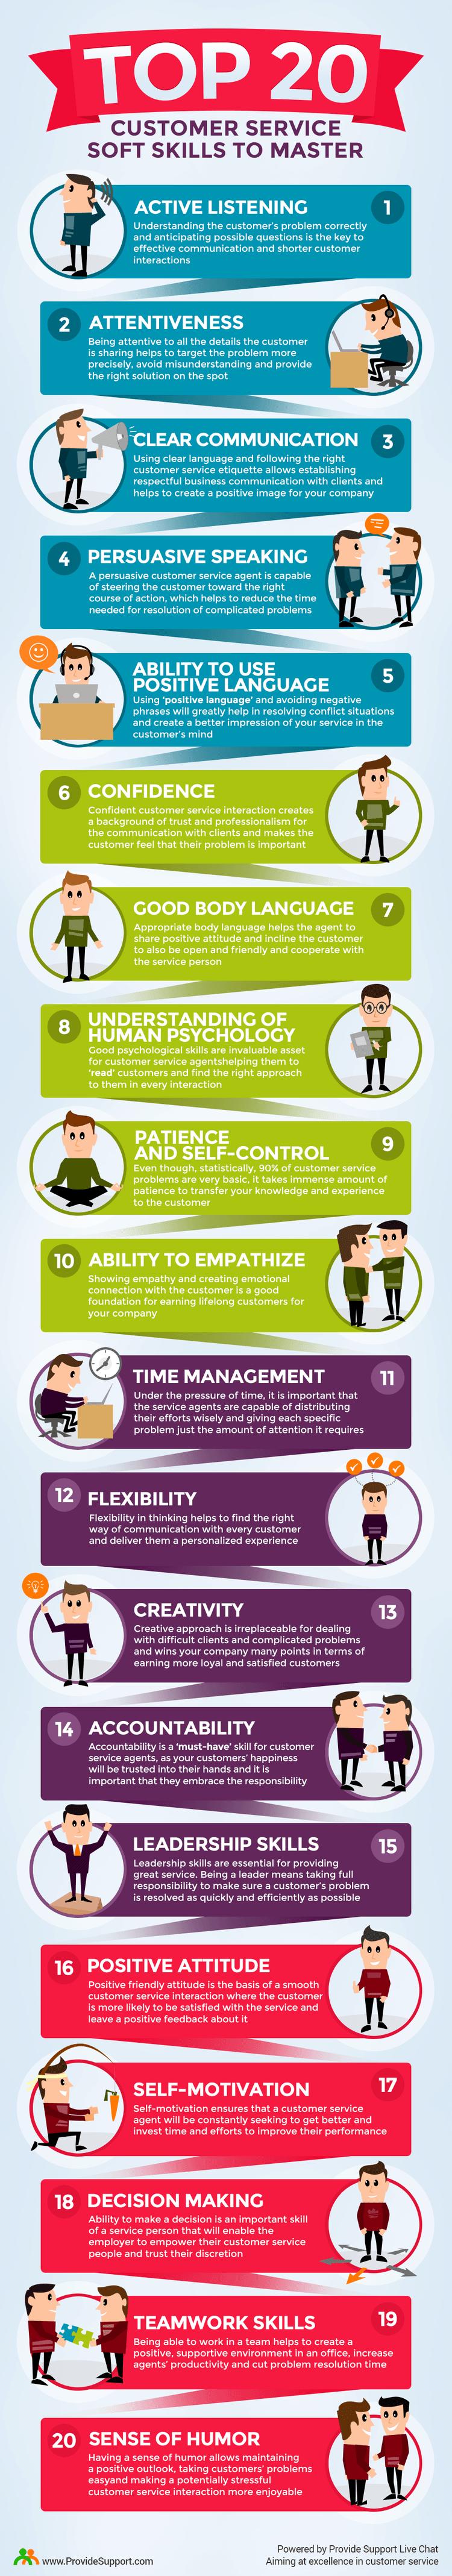 top-20-customer-service-soft-skills-min